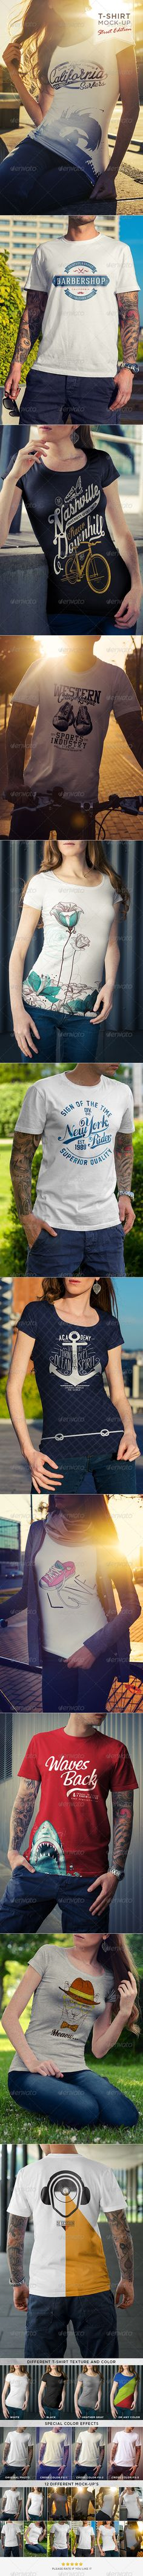 T-Shirt Mock-Up / Street Edition